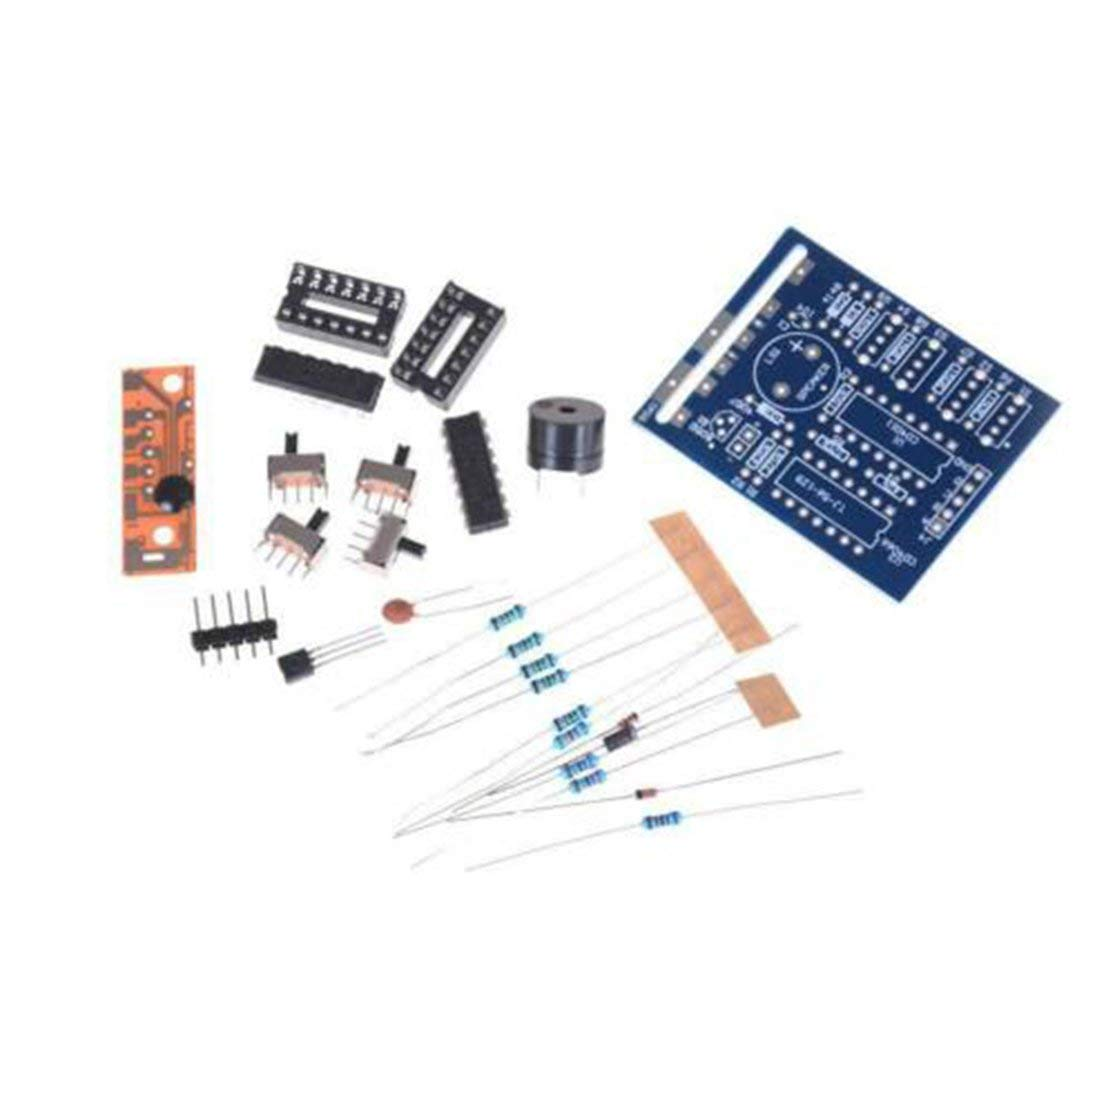 Candybarbar 16 Music Box 16 Sound Box BOX-16 16-Ton-Box-Elektronikmodul DIY Kit DIY-Teile-Komponenten Zubeh/ör-Kits Brett